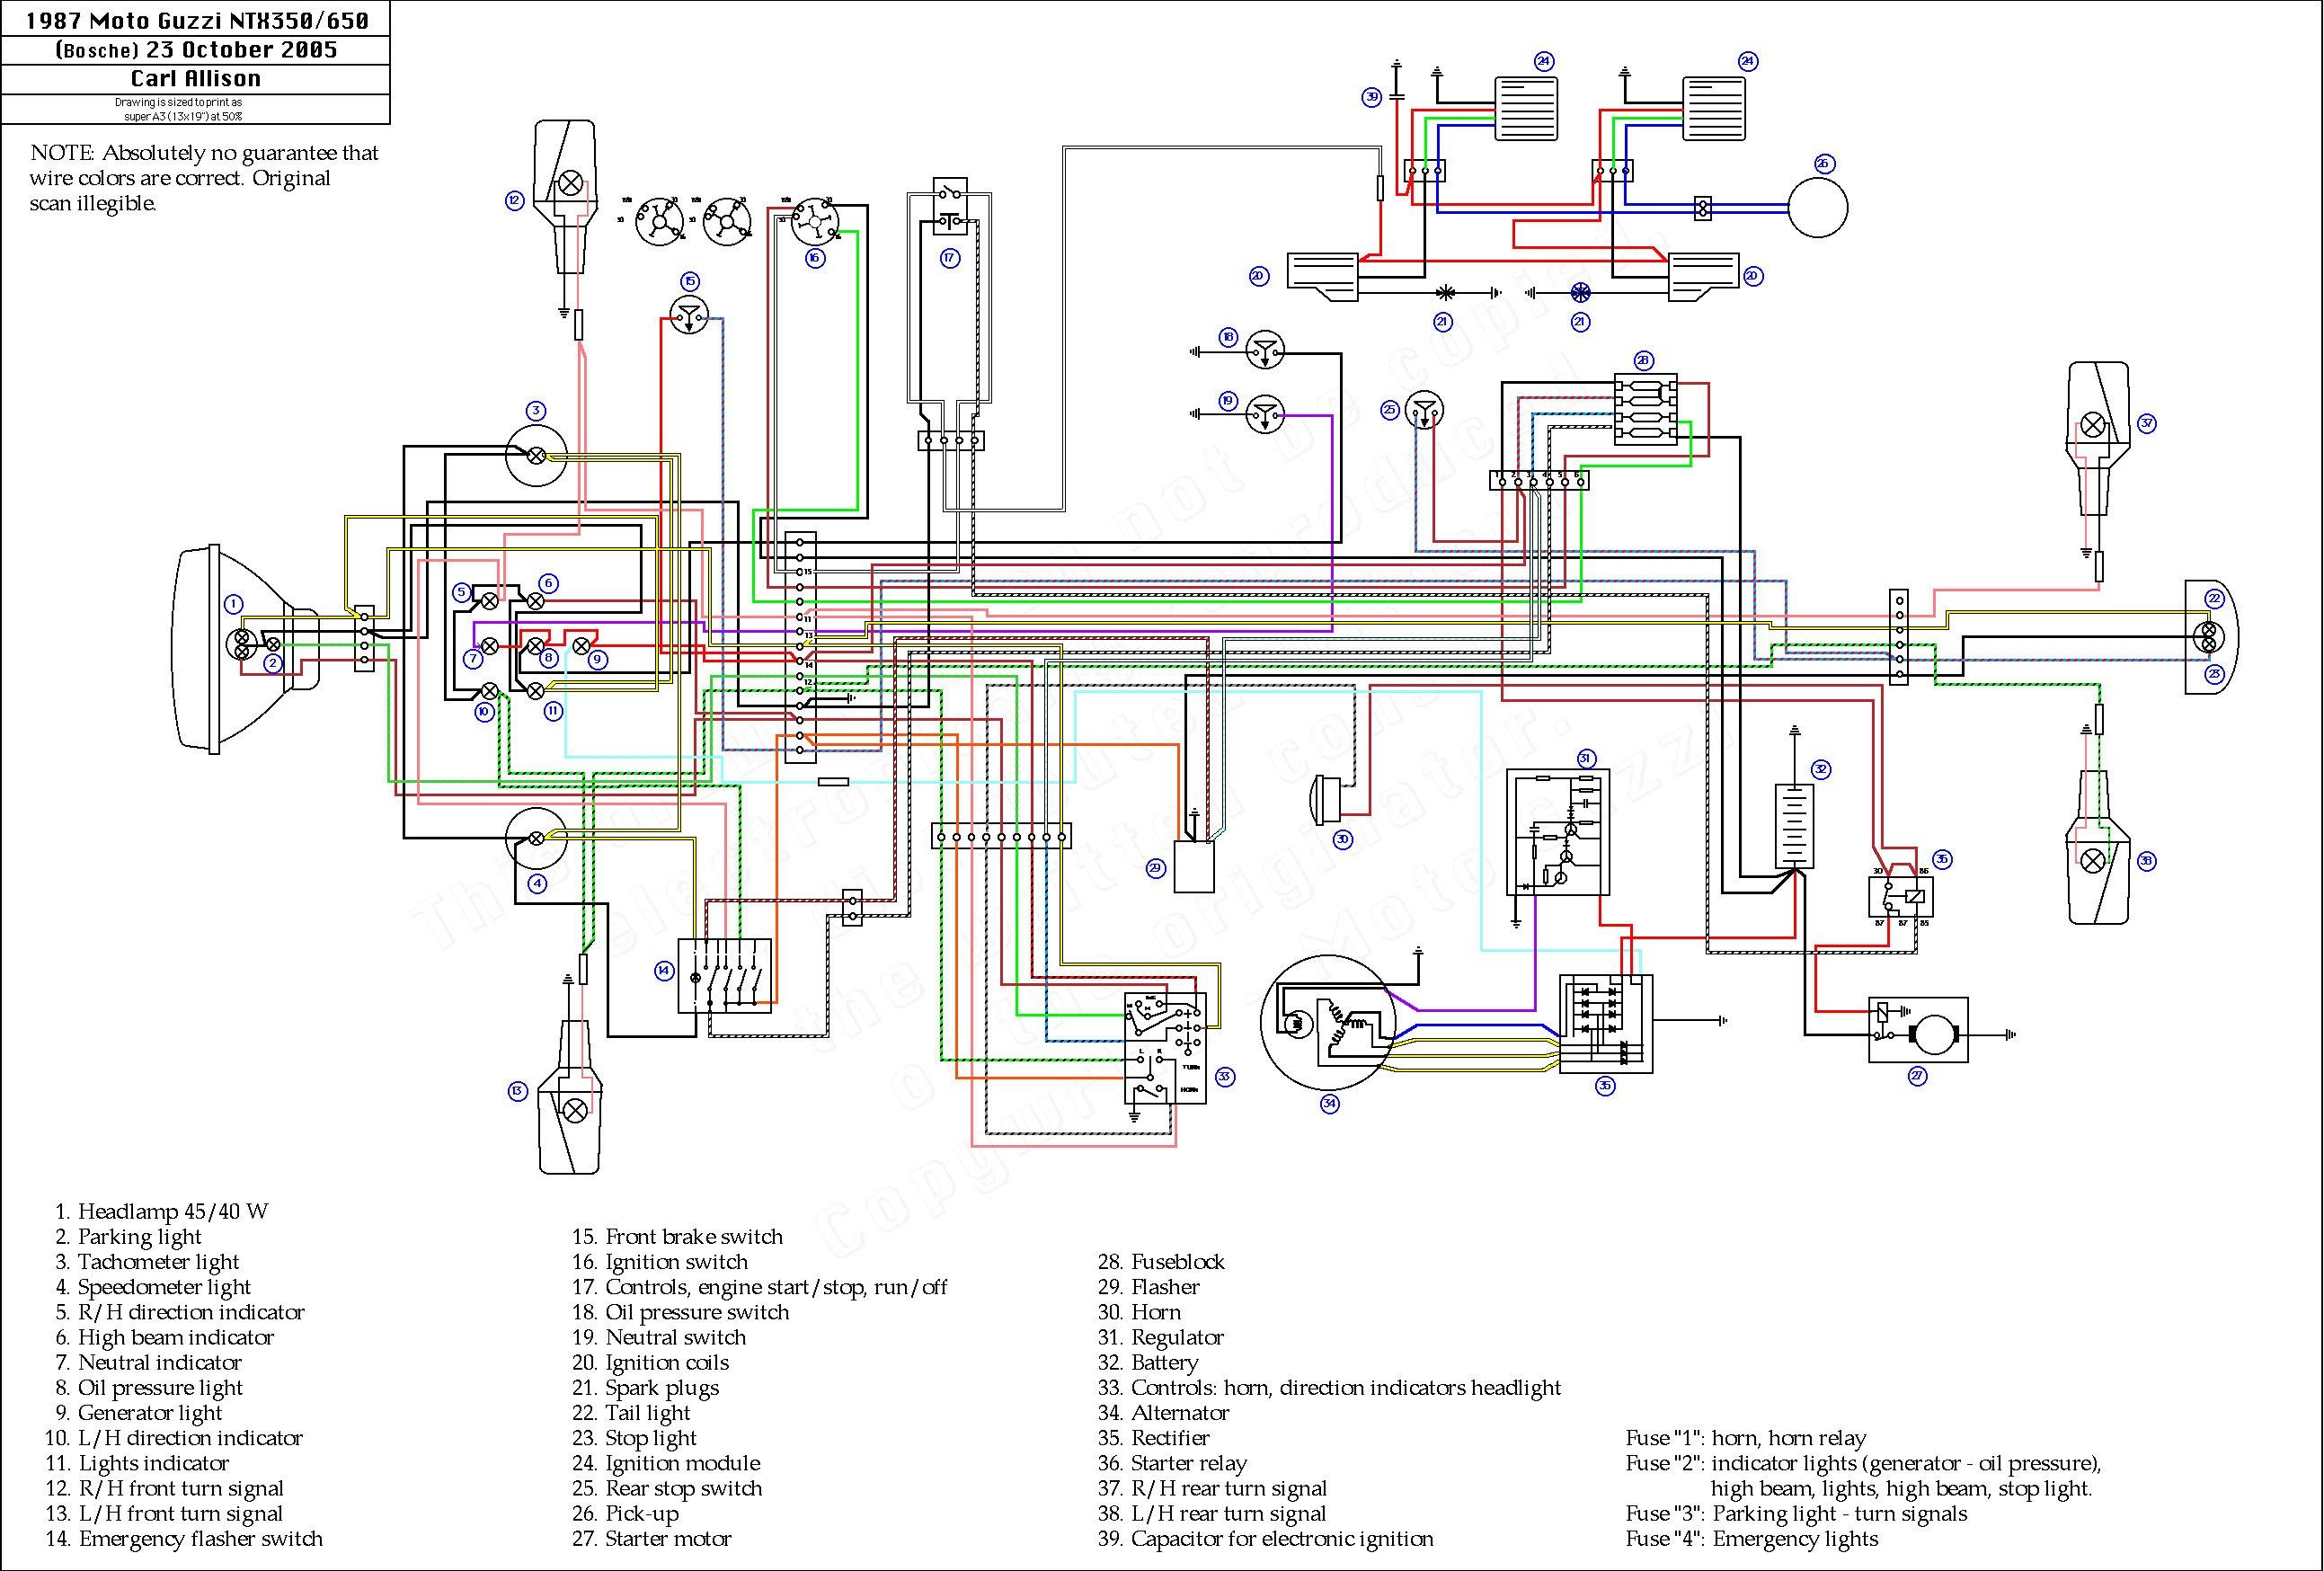 2000 Yamaha Warrior Wiring Schematic - Var Wiring Diagram grow-regular -  grow-regular.europe-carpooling.itCarpooling